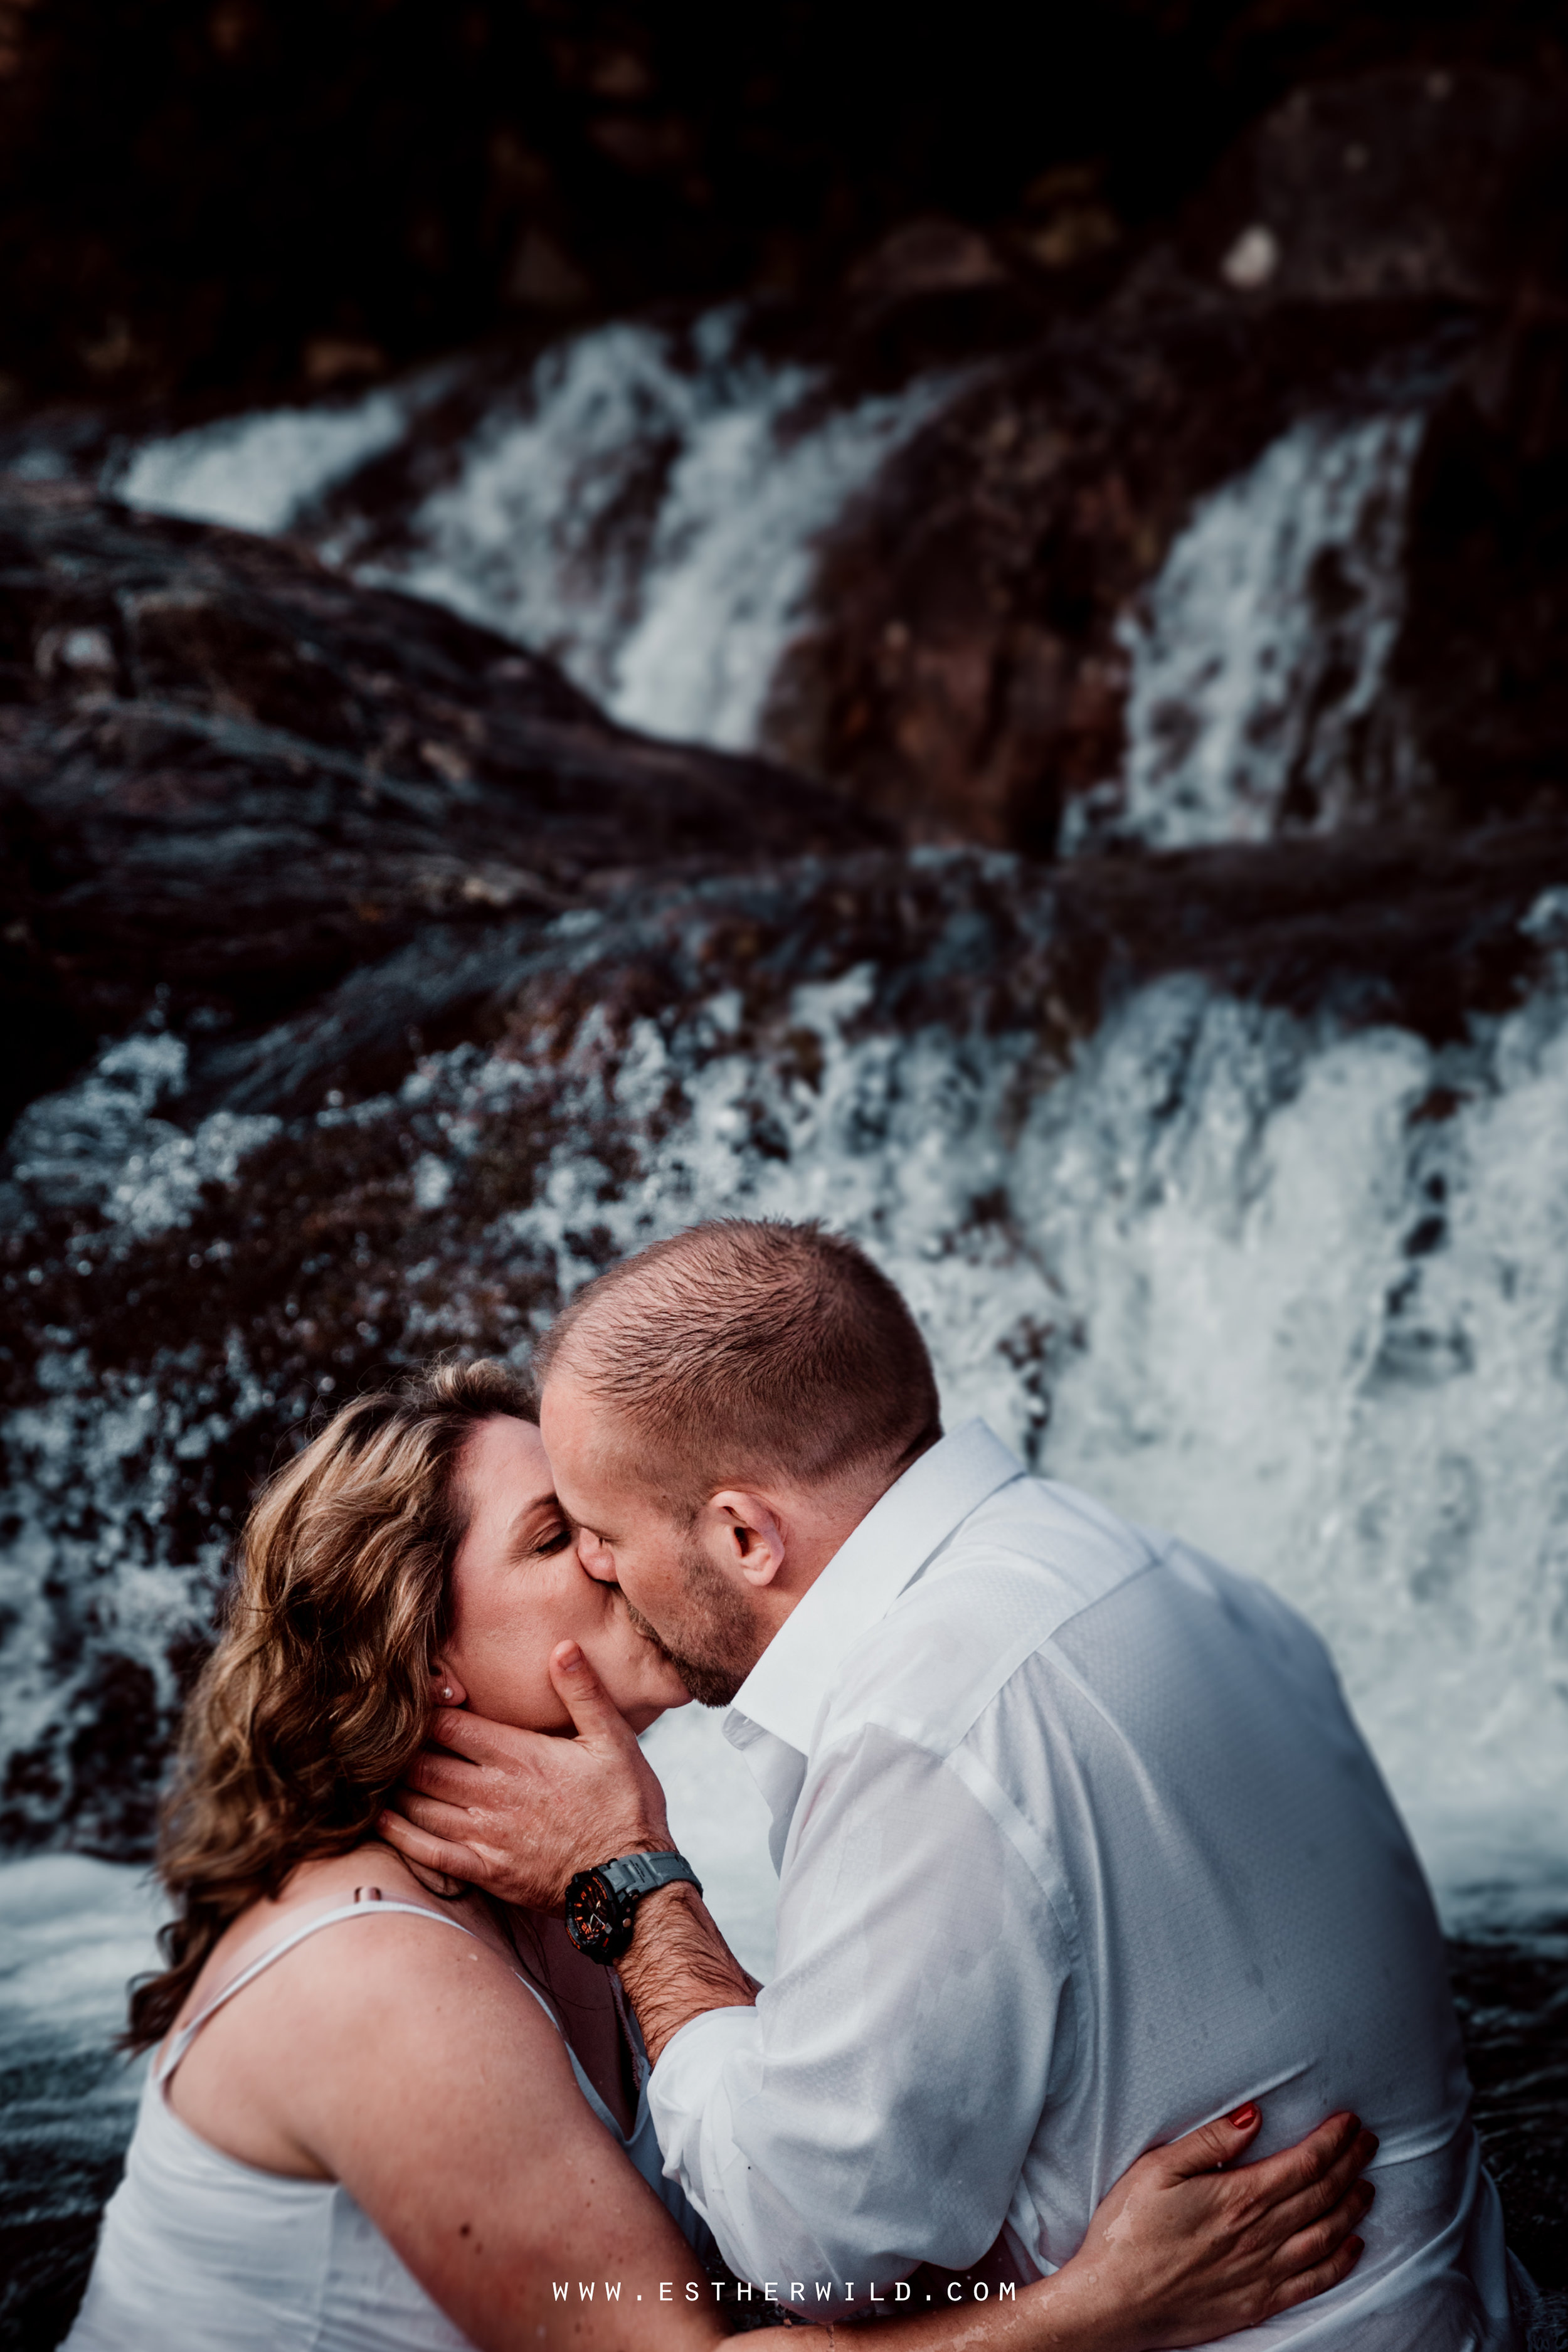 Cumbria_Lake_District_Wasdale_Wedding_Photographer_Destination_Engagement_Anniversary_Esther_Wild_IMG_4378.jpg